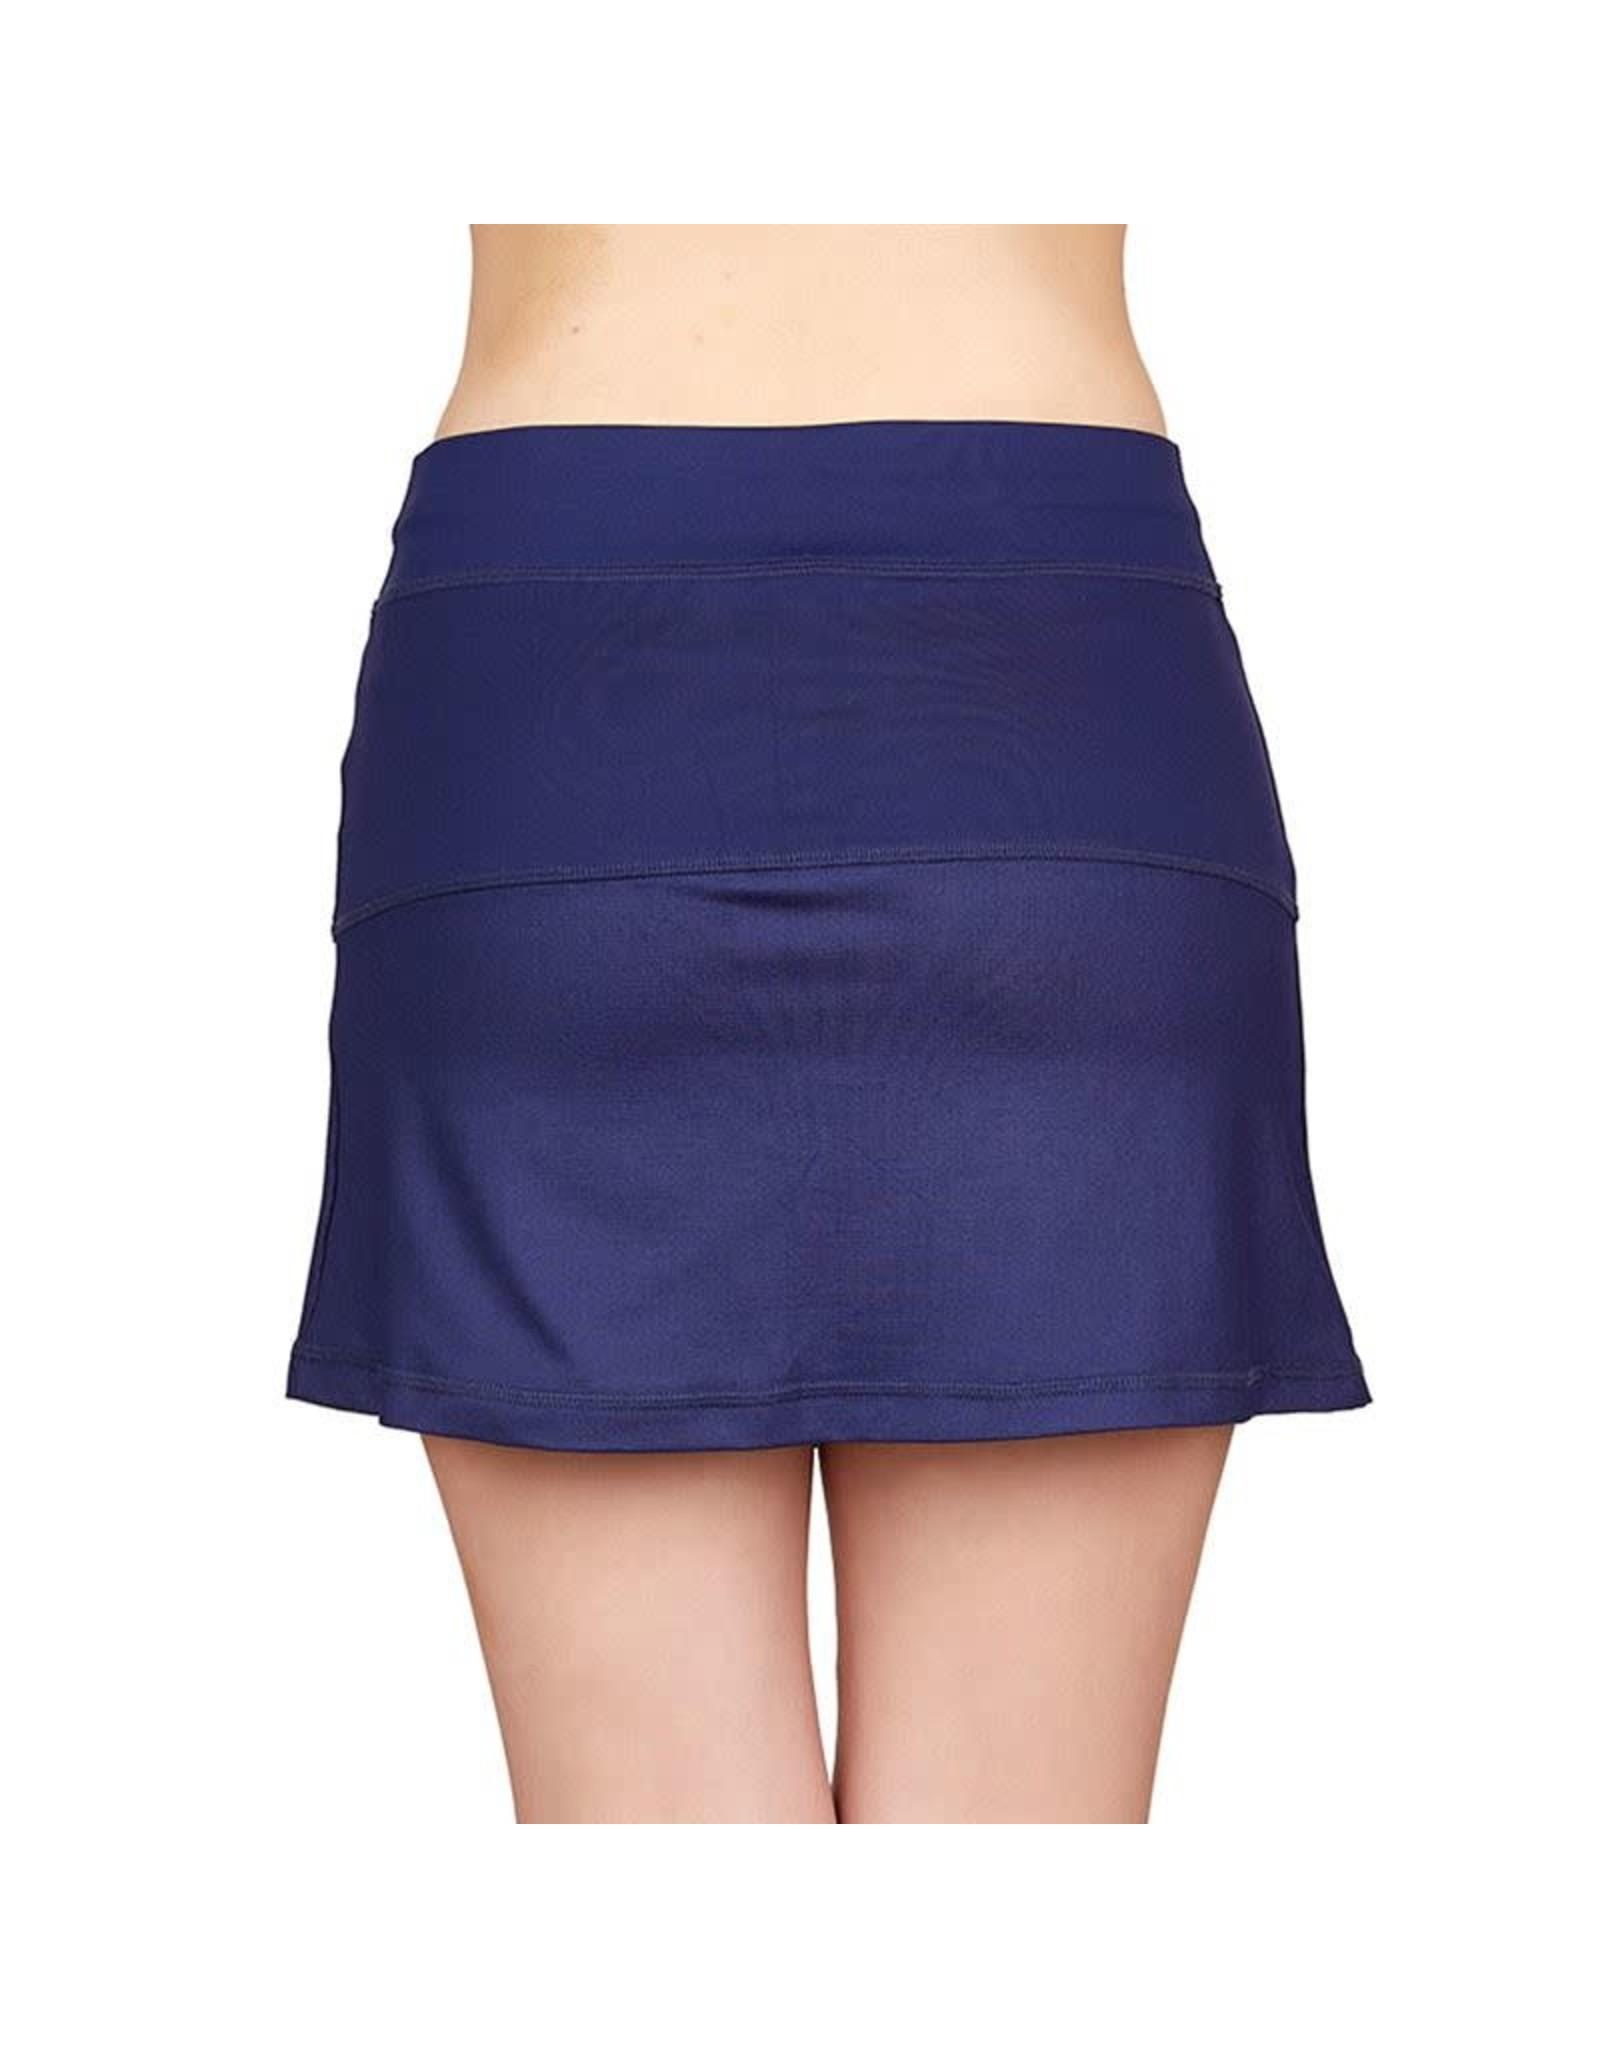 Sofibella Allure 14 inch Ruffle Skirt